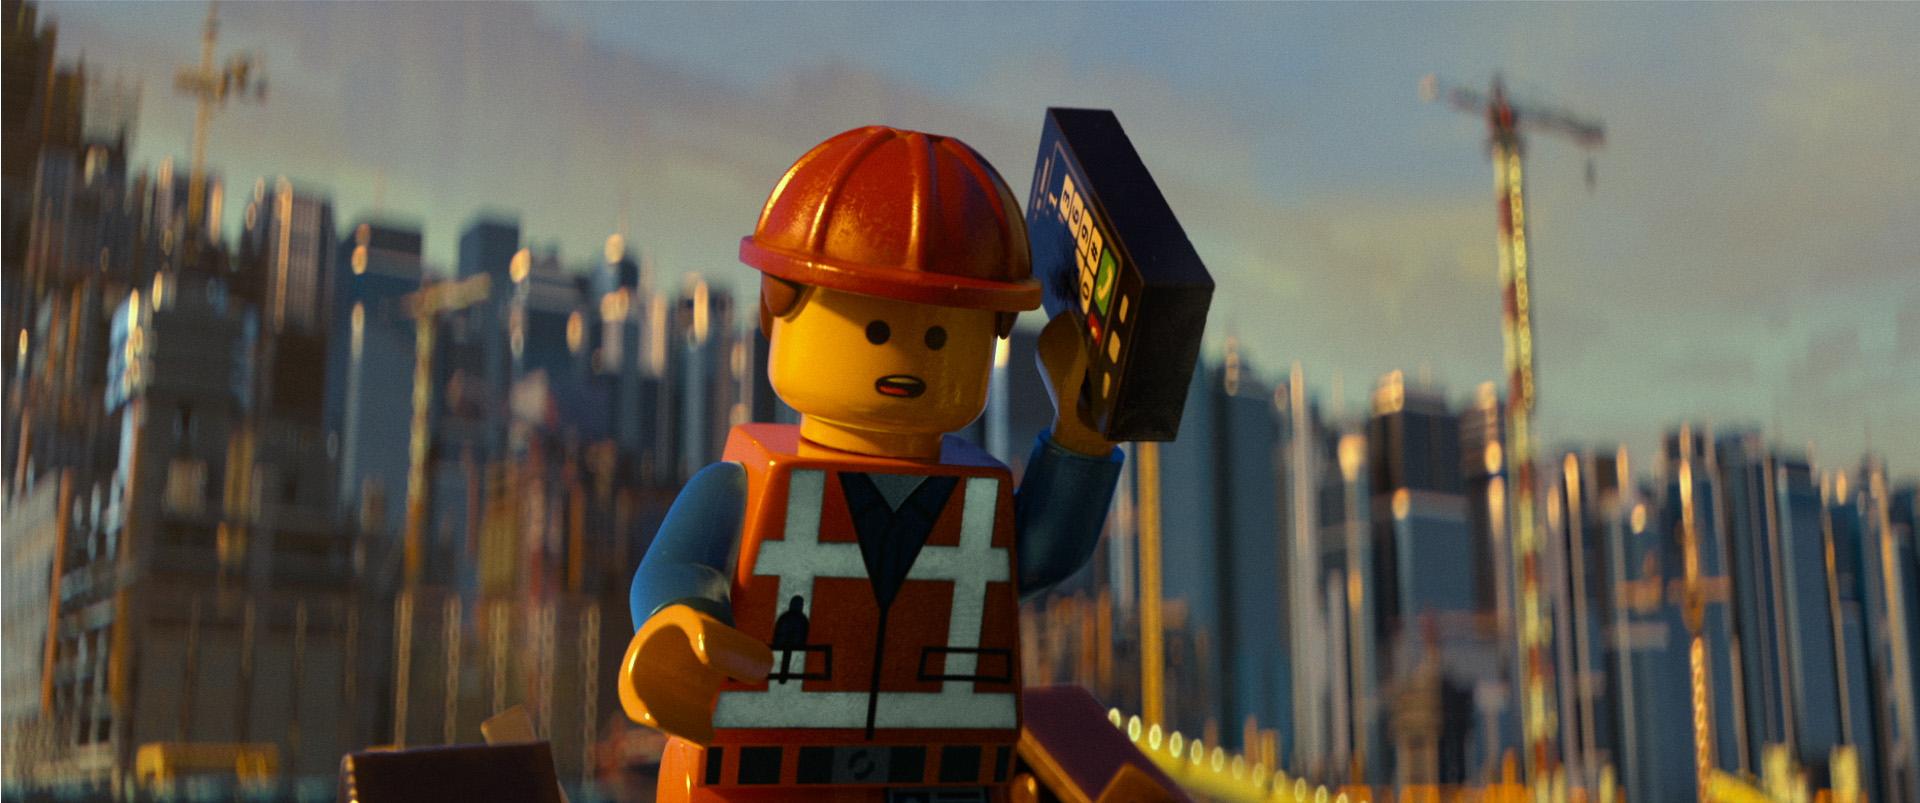 LEGO_jelenetfoto (8).jpg